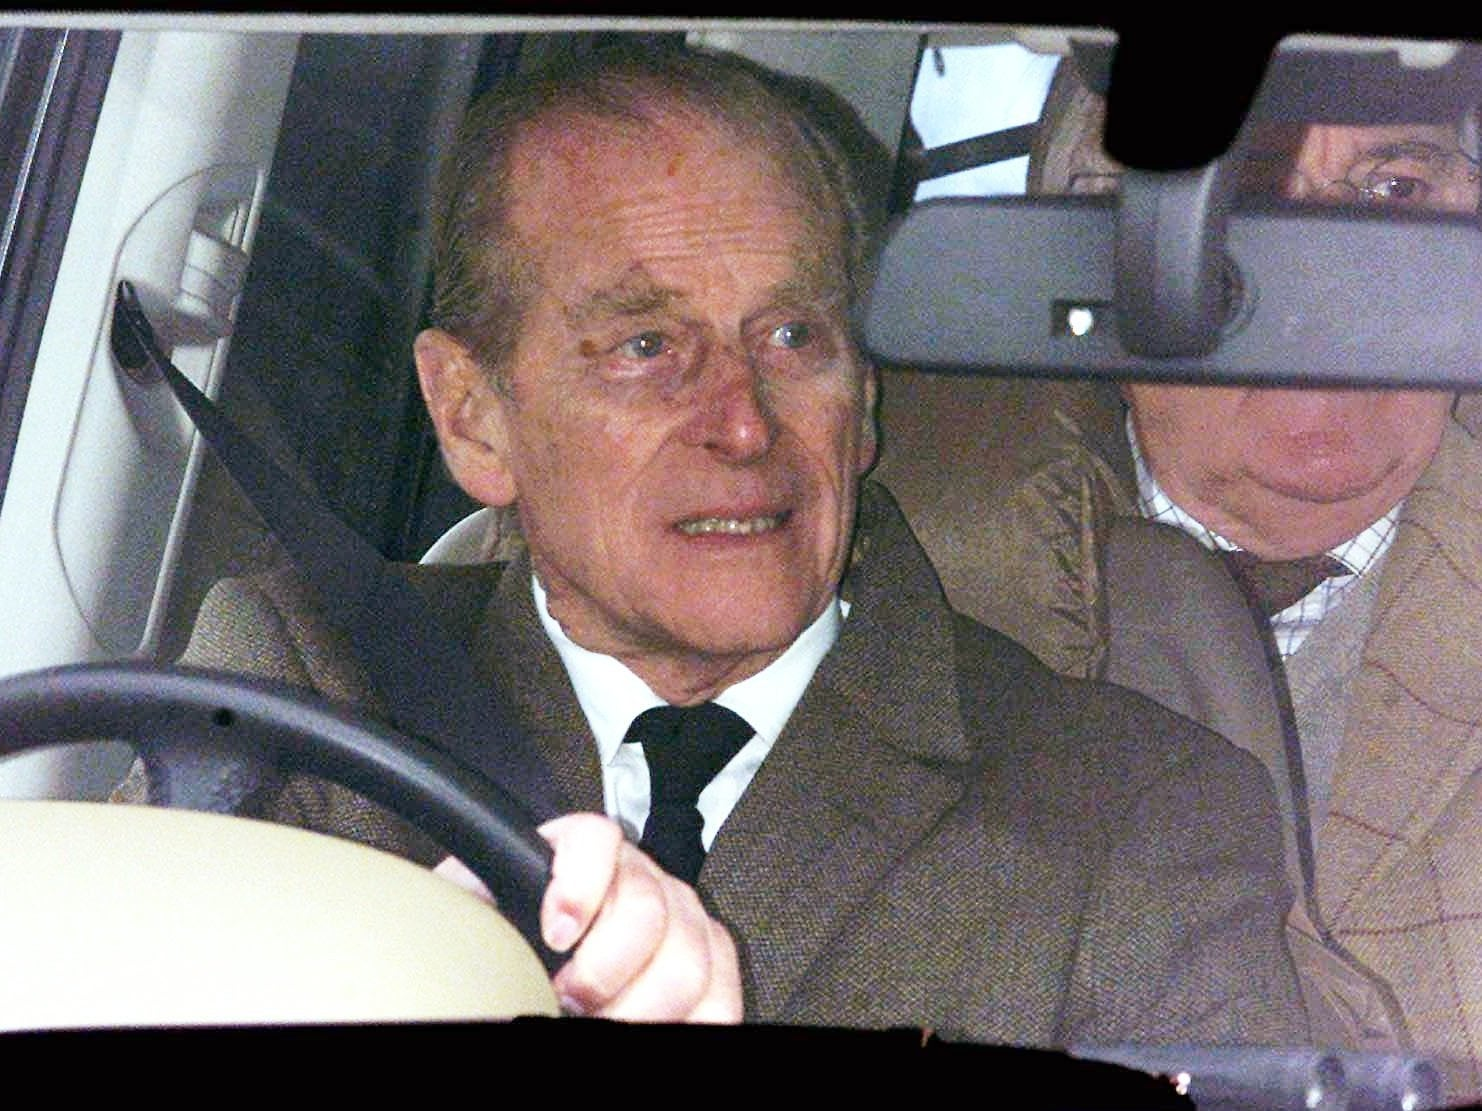 Prince Philip car crash: Duke of Edinburgh escapes unhurt after accident near Sandringham Estate